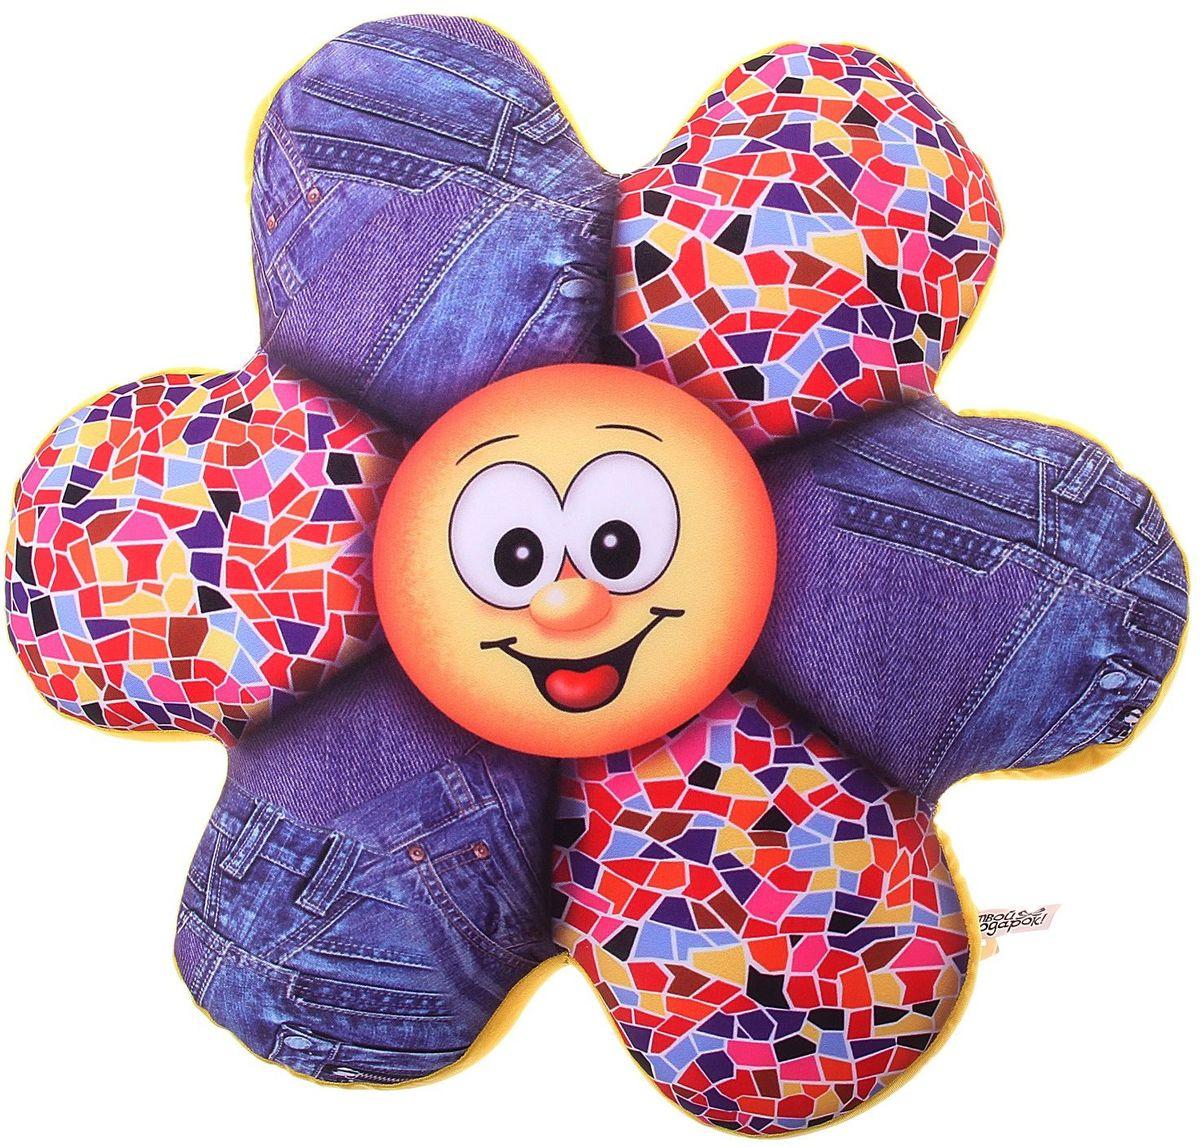 Sima-land Мягкая игрушка-антистресс Солнышко 330465 sima land мягкая игрушка на руку мальчик 1147835